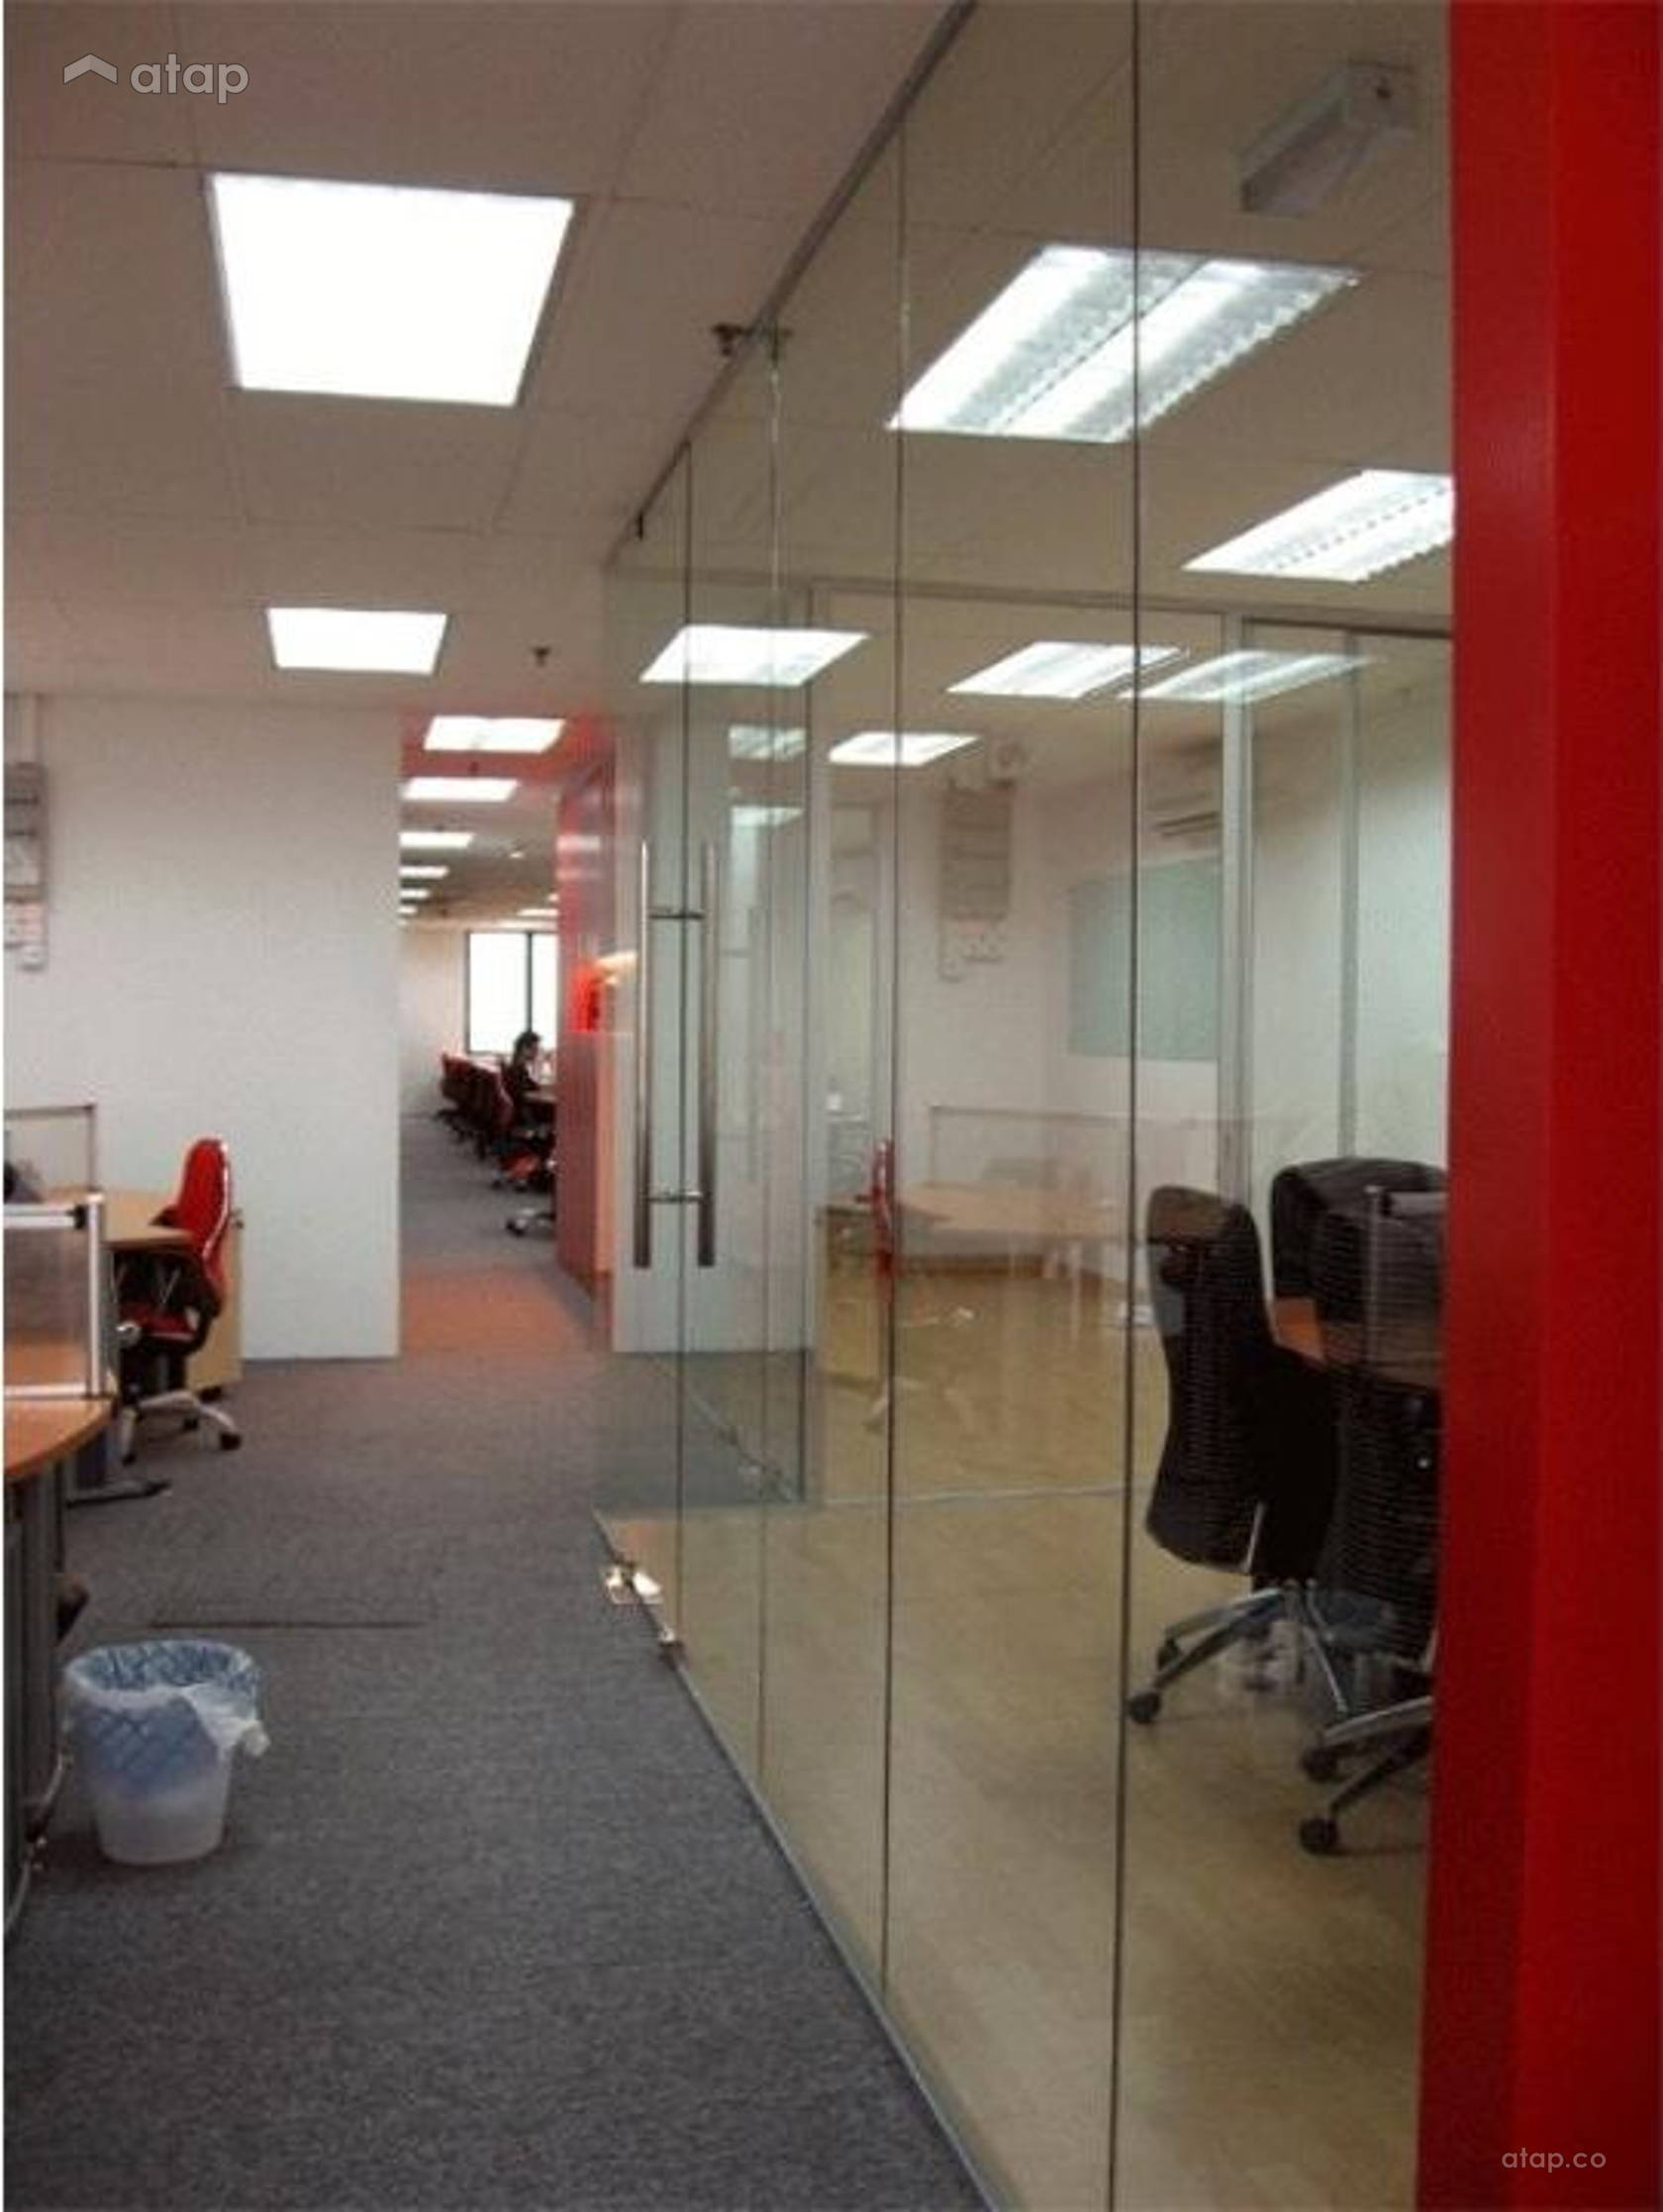 office renovation ideas. Inphosoft Office Interior Design Renovation Ideas, Photos And Price In Malaysia | Atap.co Ideas E